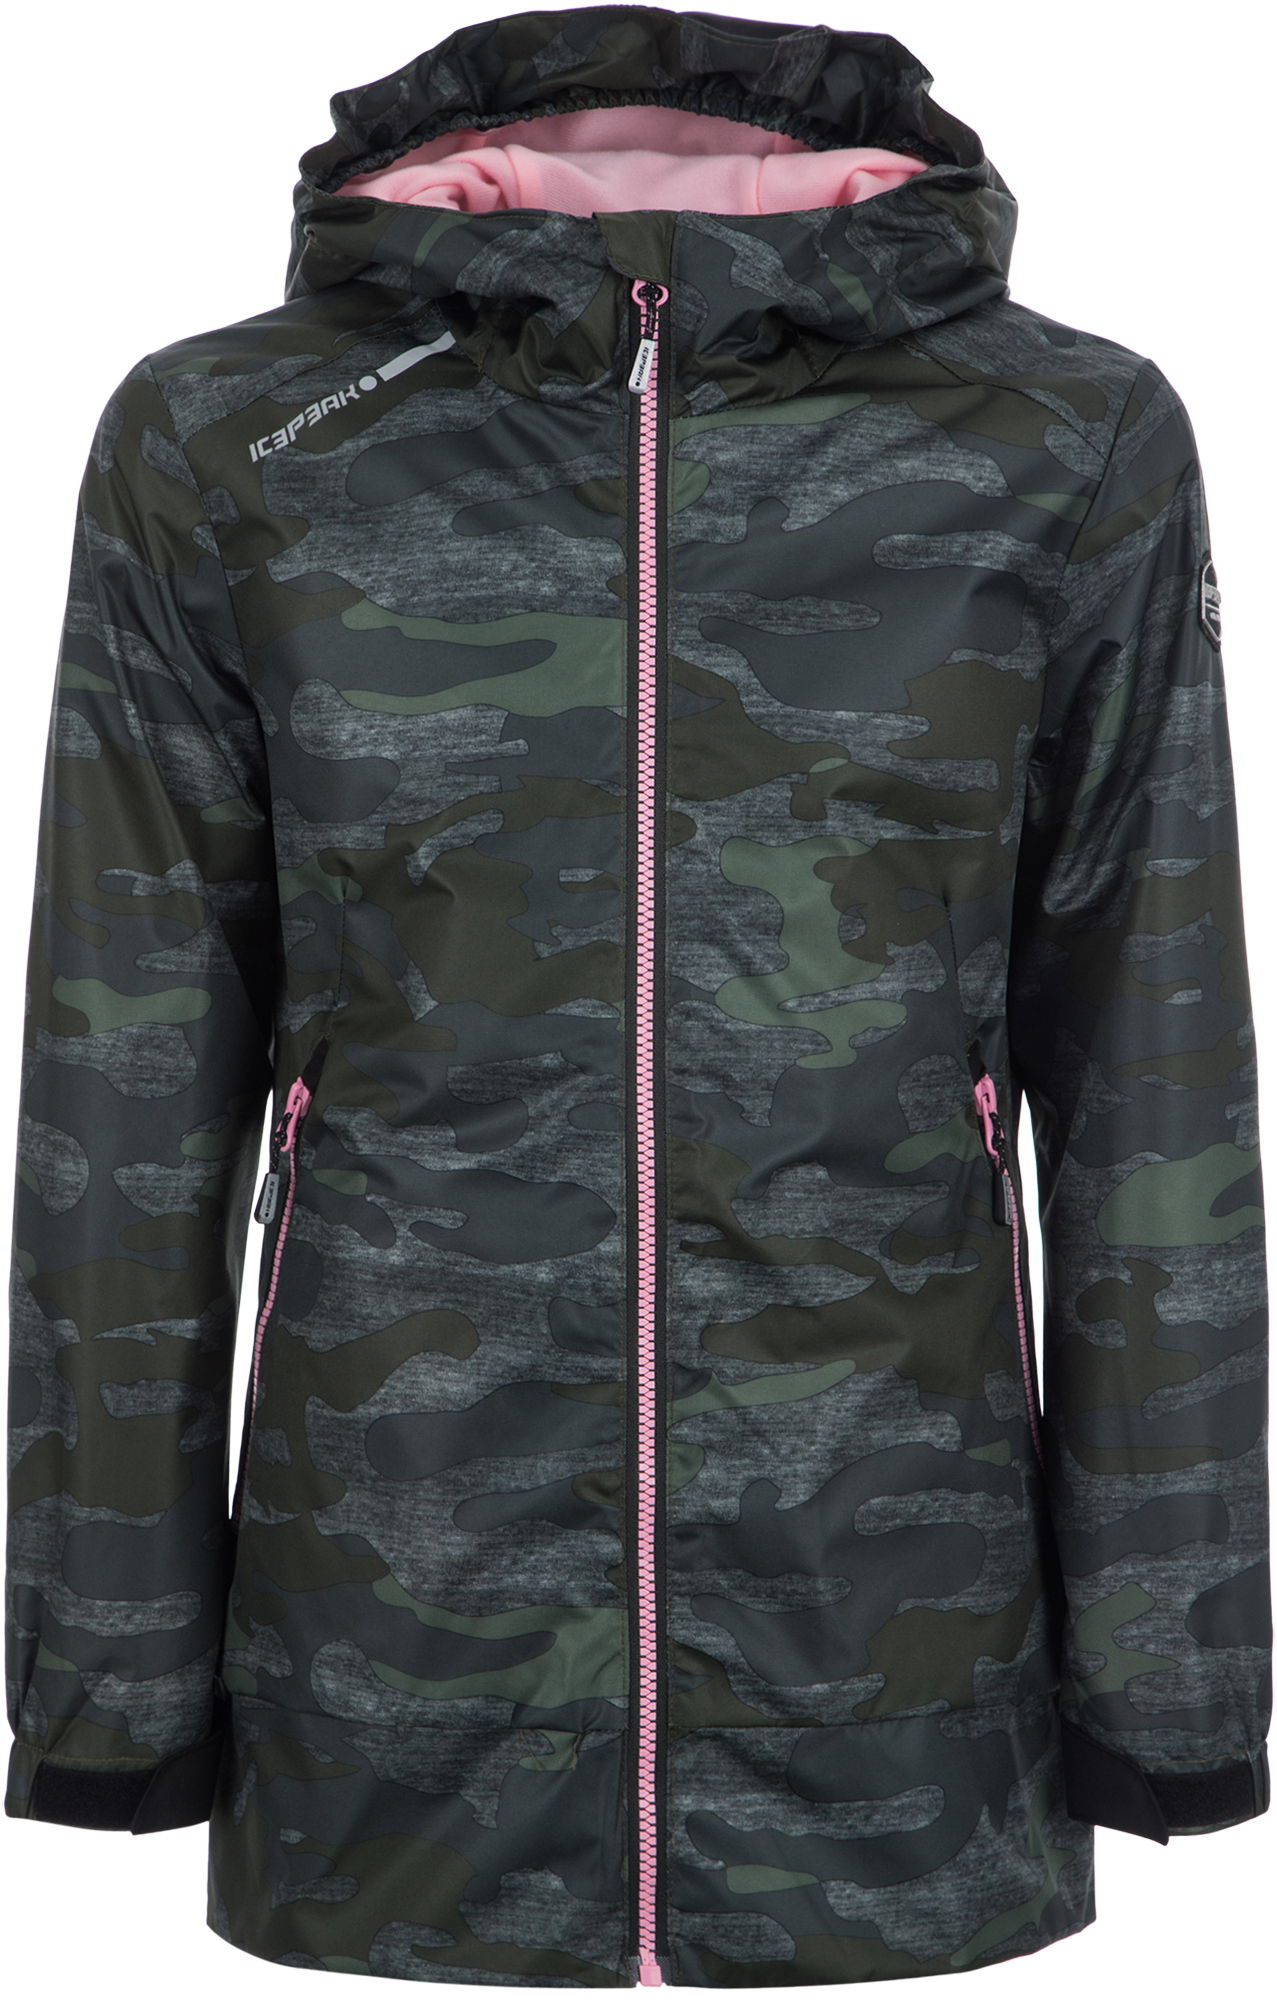 IcePeak Куртка для девочек IcePeak Tierra, размер 128 костюм куртка брюки для девочек icepeak 452002654iv цвет фиолетовый р 164 100%полиэстер 740